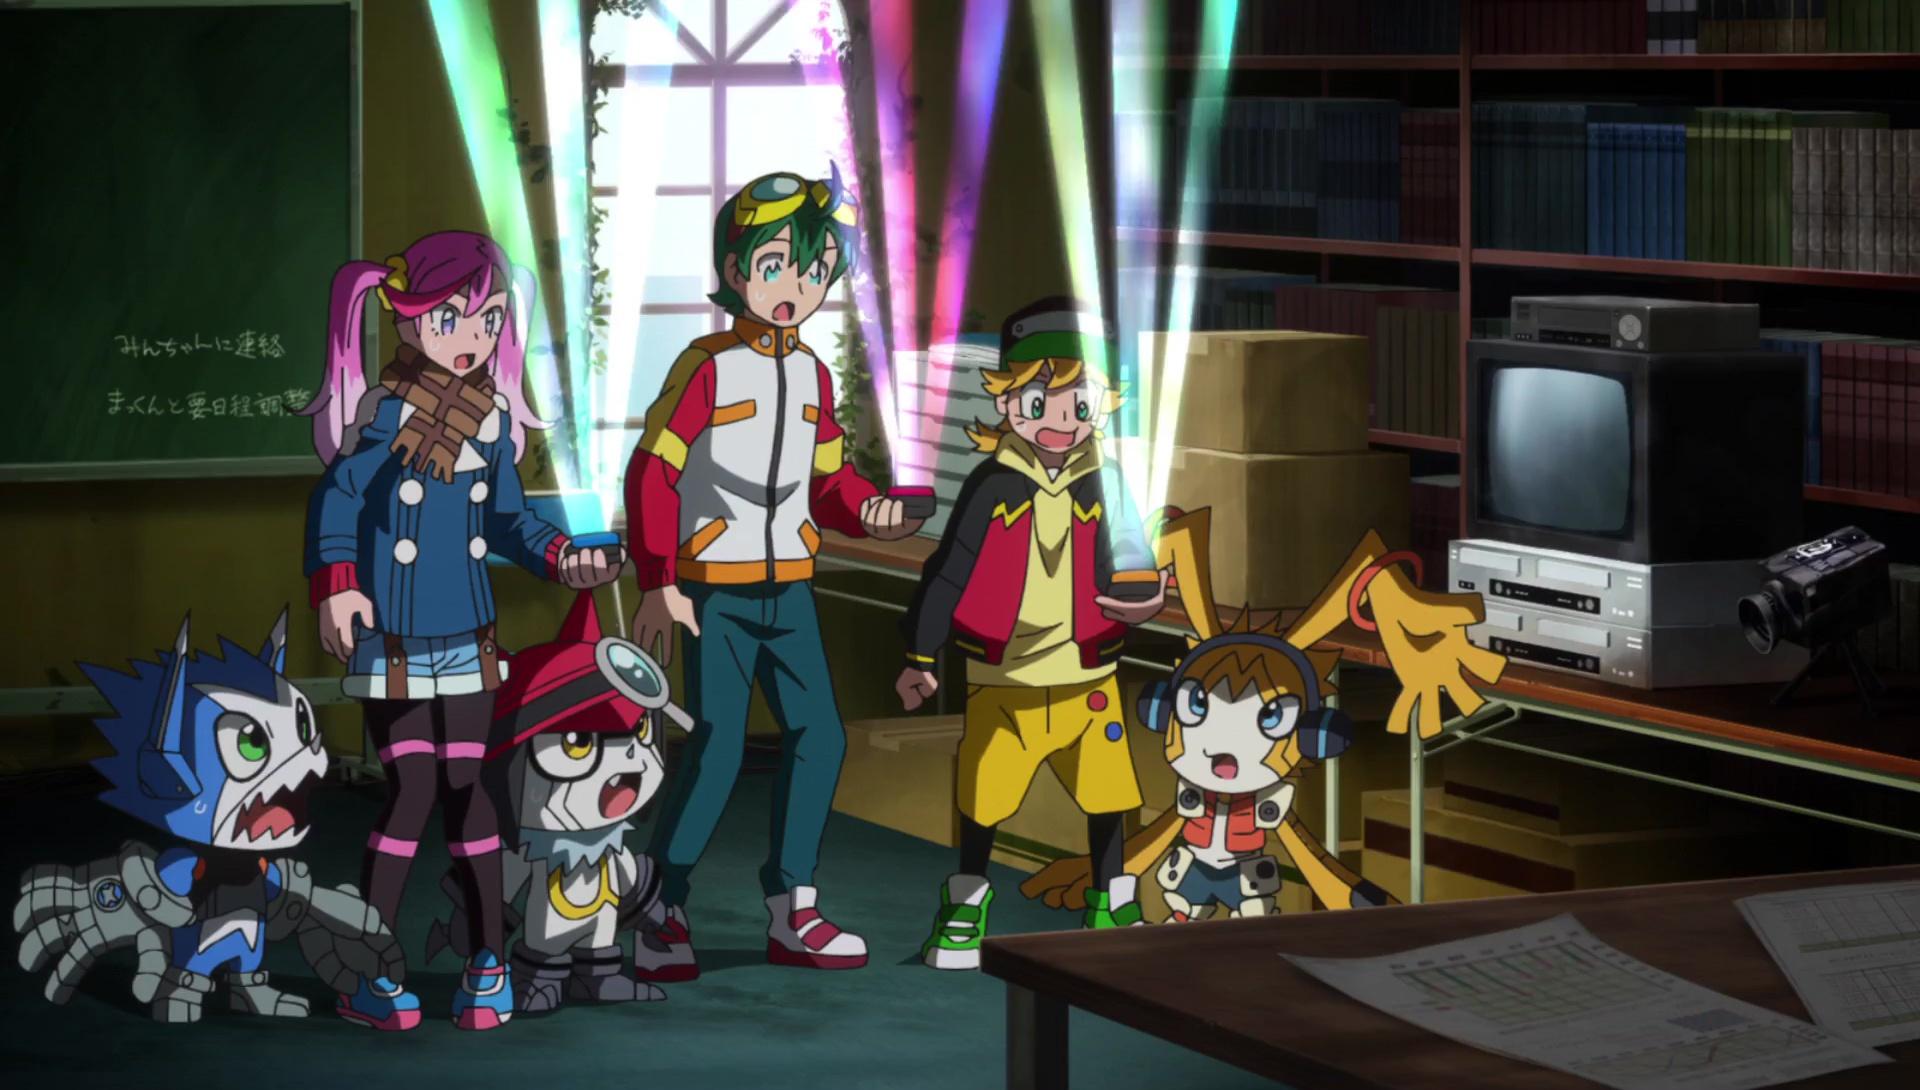 [VOSTFR] Digimon Universe Appli Monsters : Episode 16